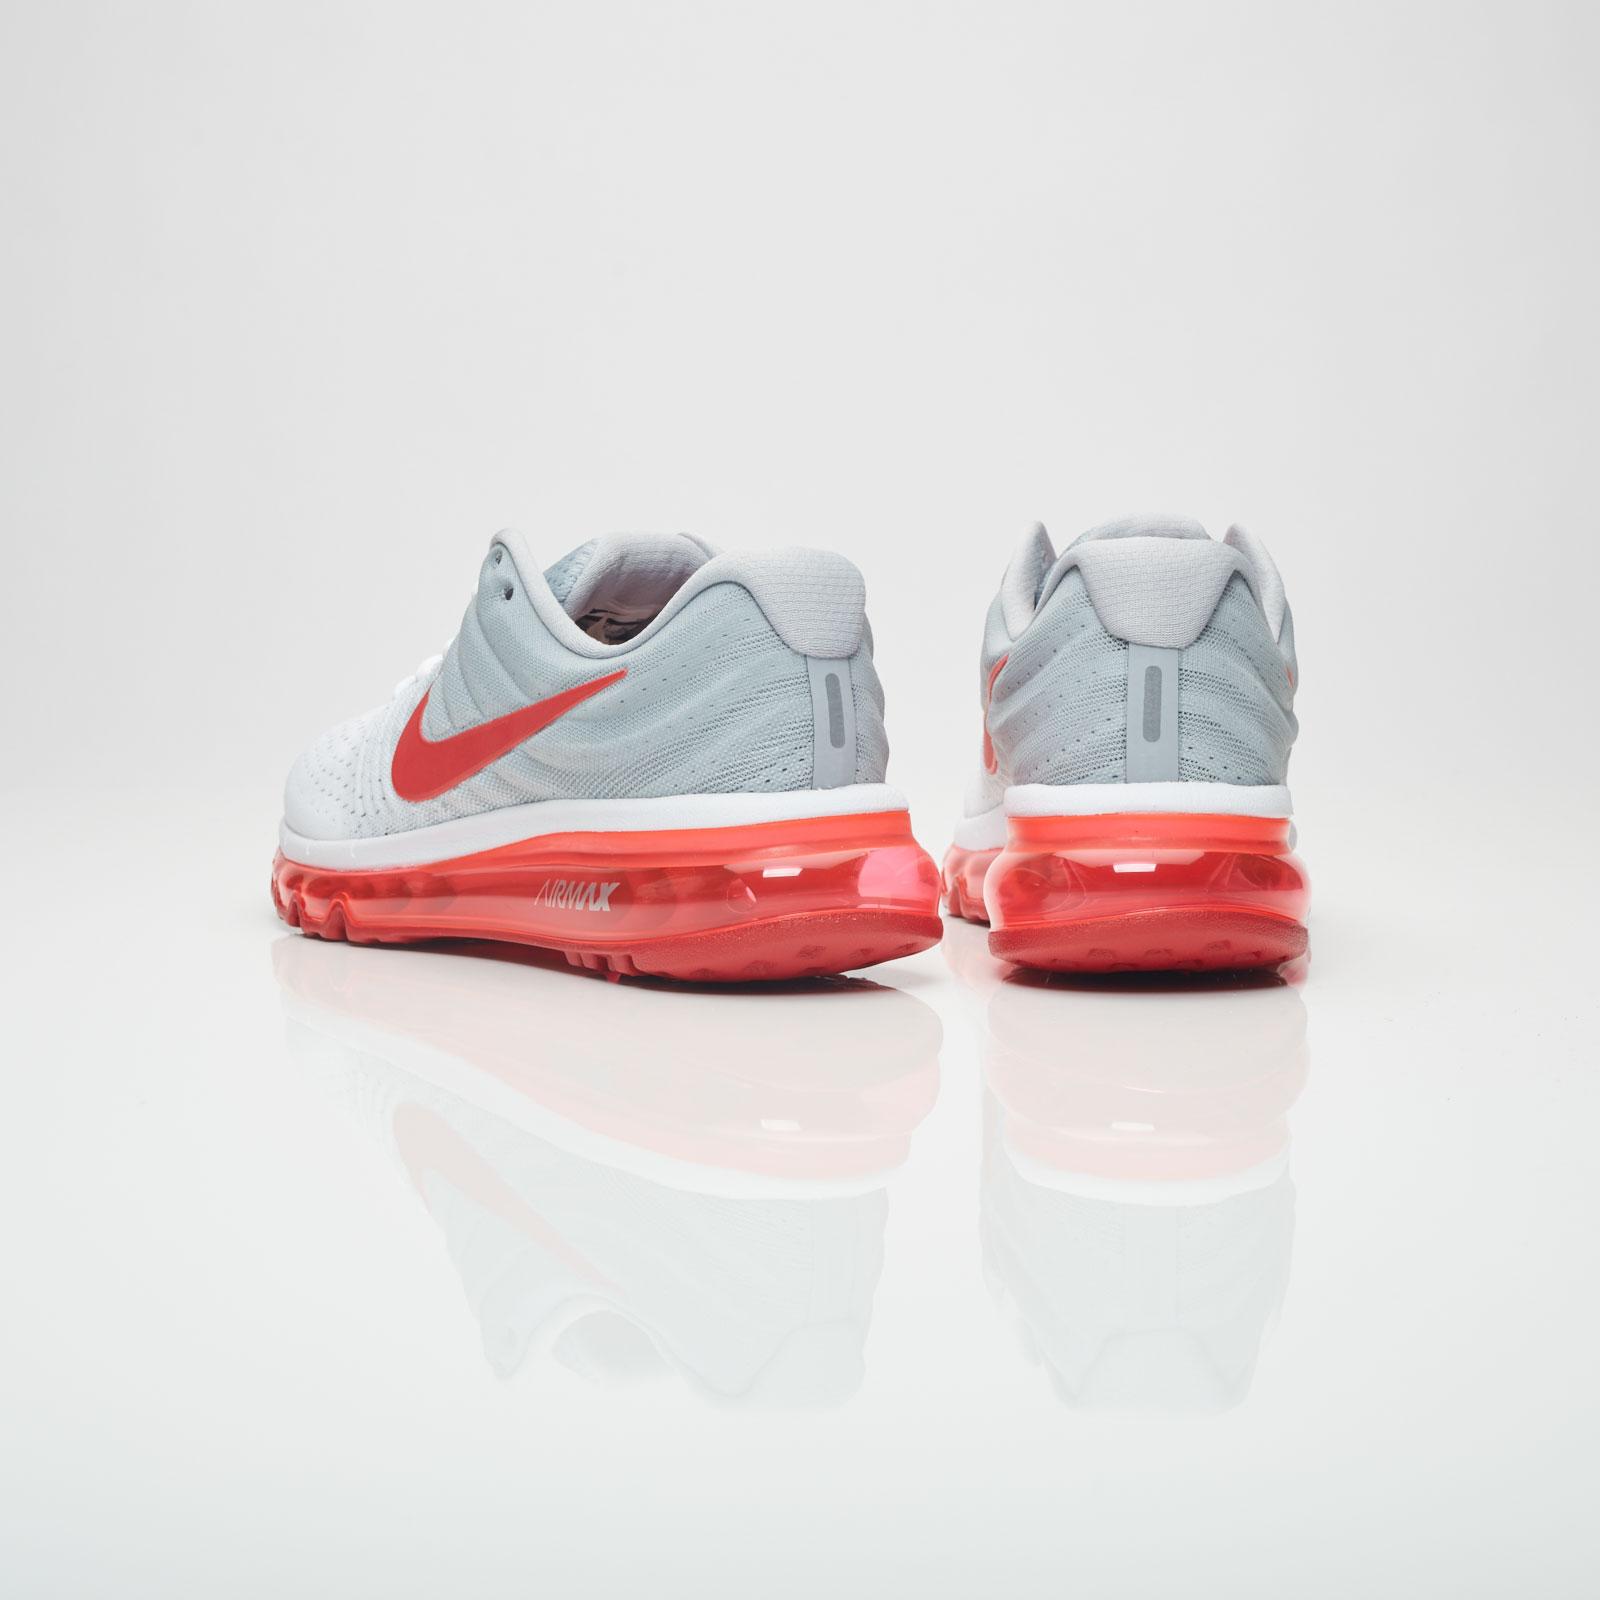 Nike Air Max 2017 (Gs) 851622 101 Sneakersnstuff I